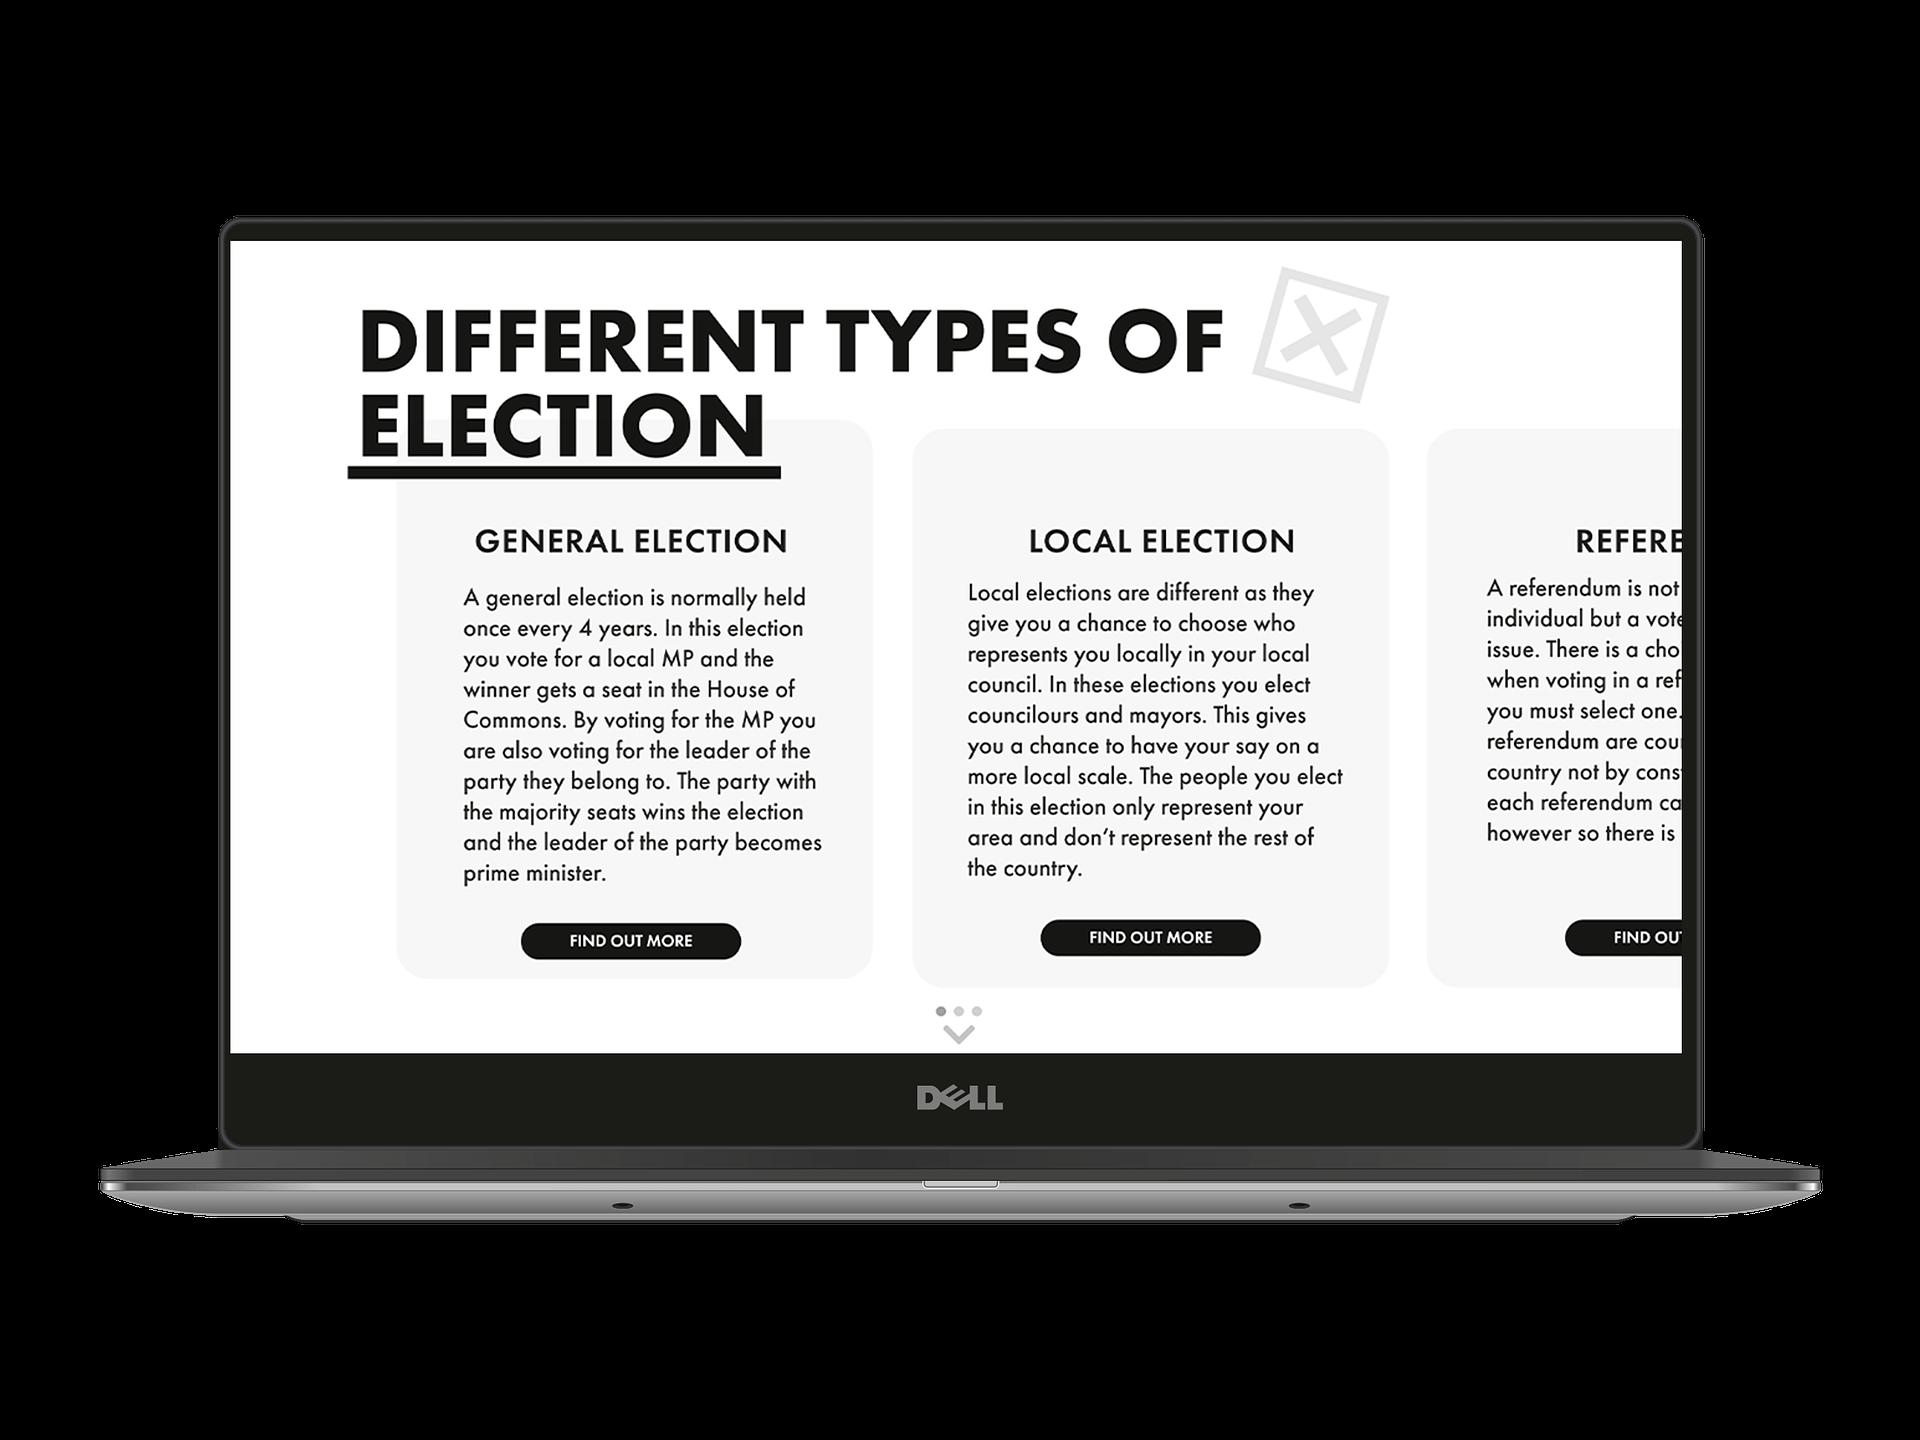 TypesofElection.png